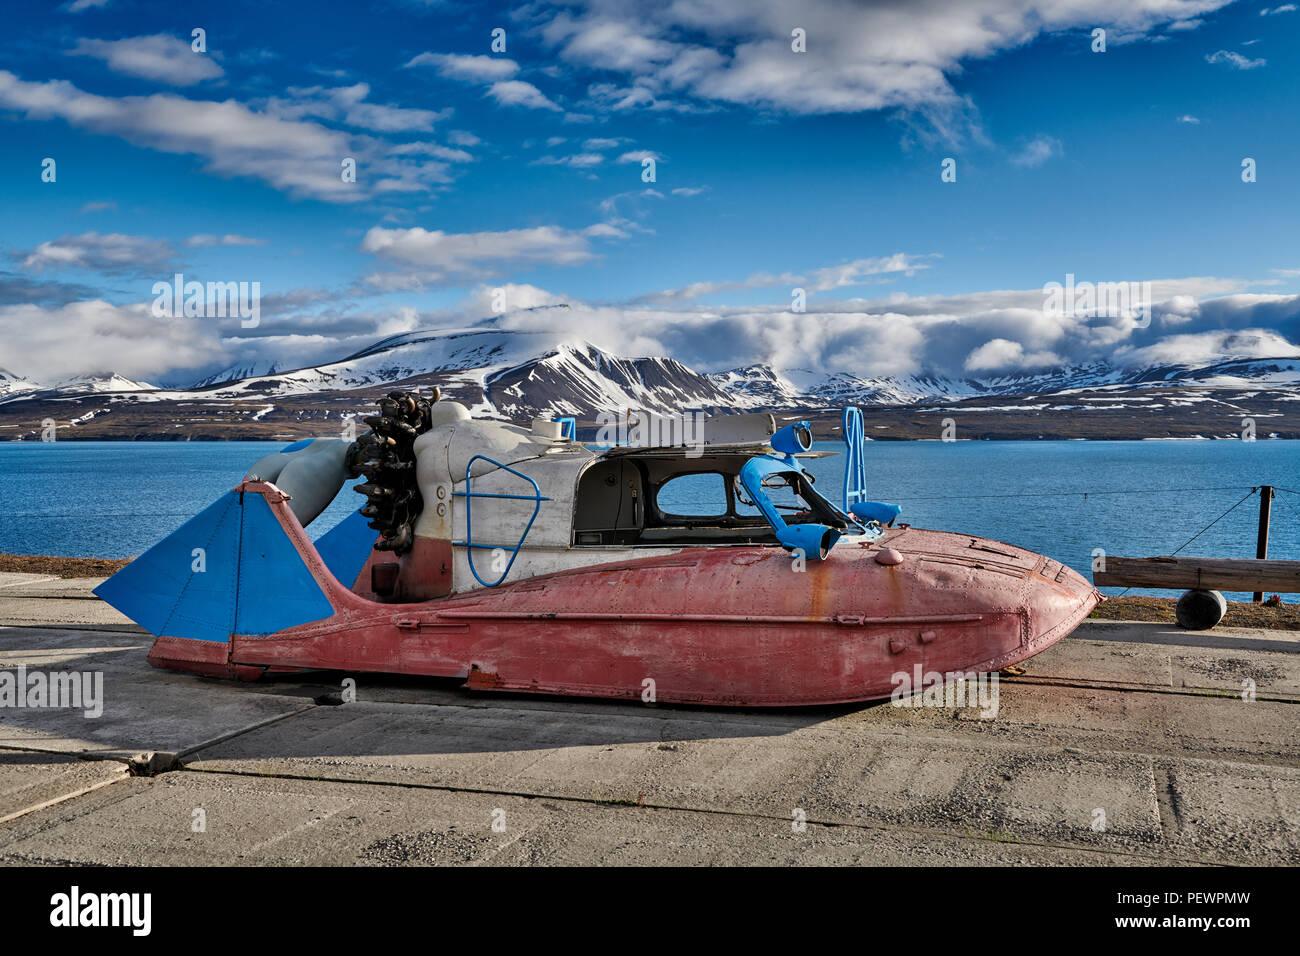 remains of strange flying boat in russian mining town Barentsburg, Svalbard or Spitsbergen, Europe - Stock Image